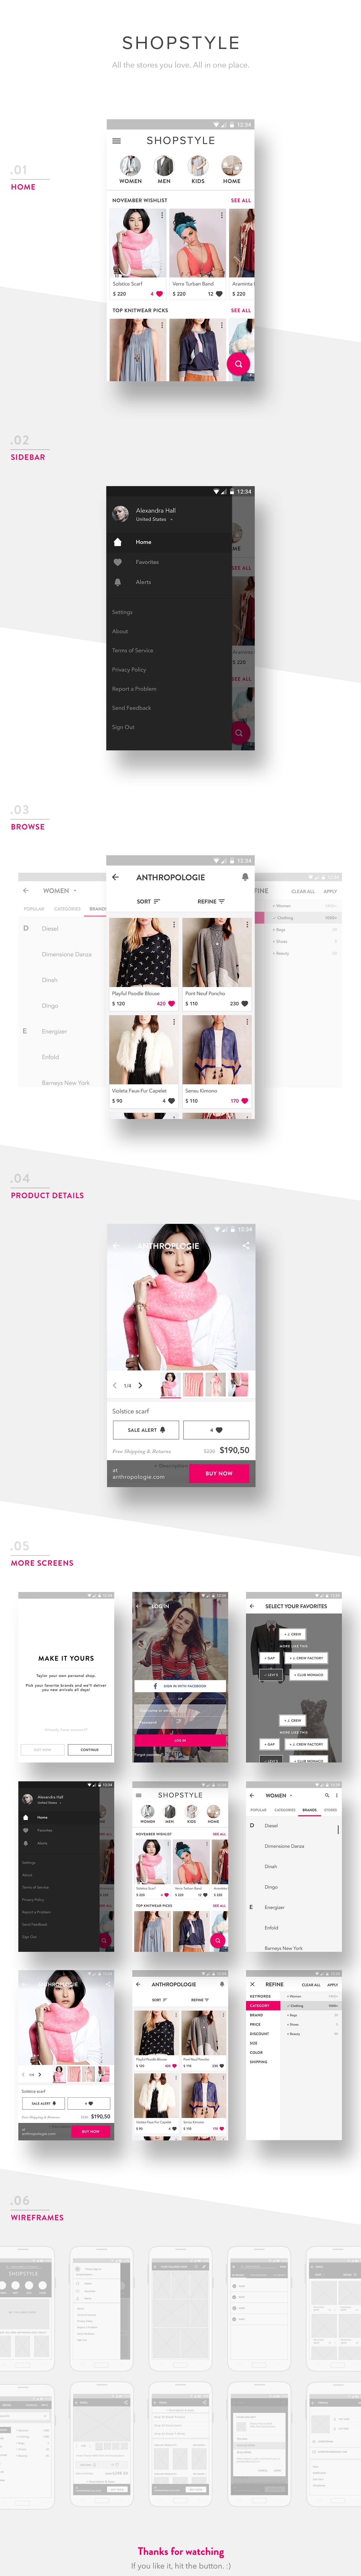 android ShopStyle material design ui design UX design app mobile design google ios9